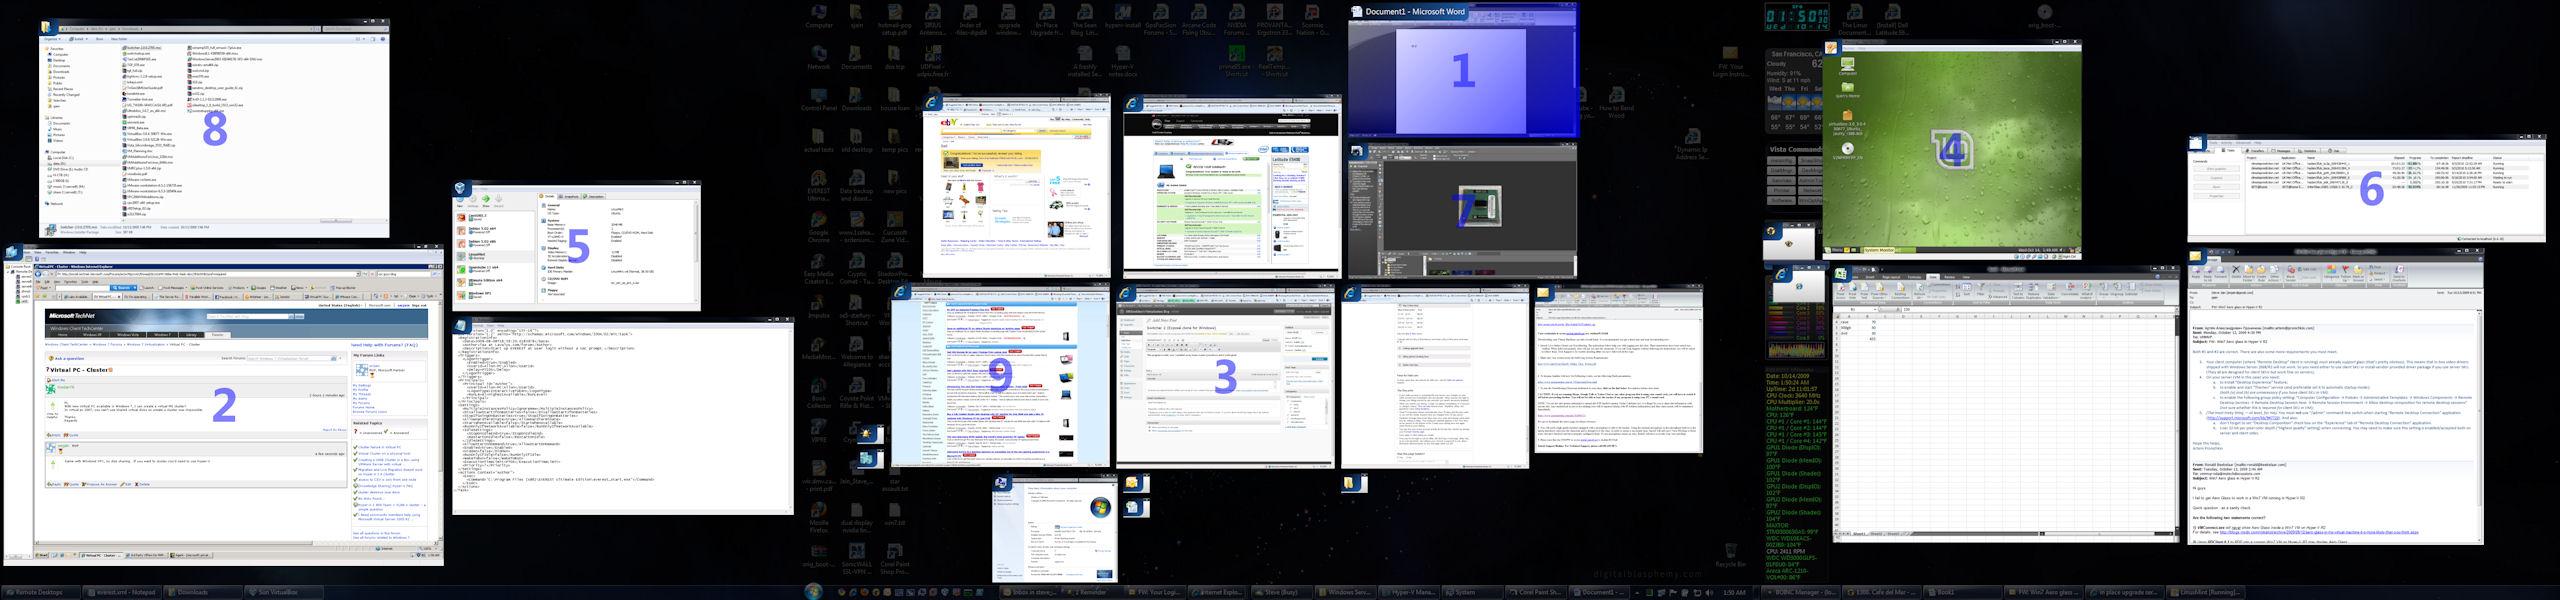 Switcher over 3 monitors